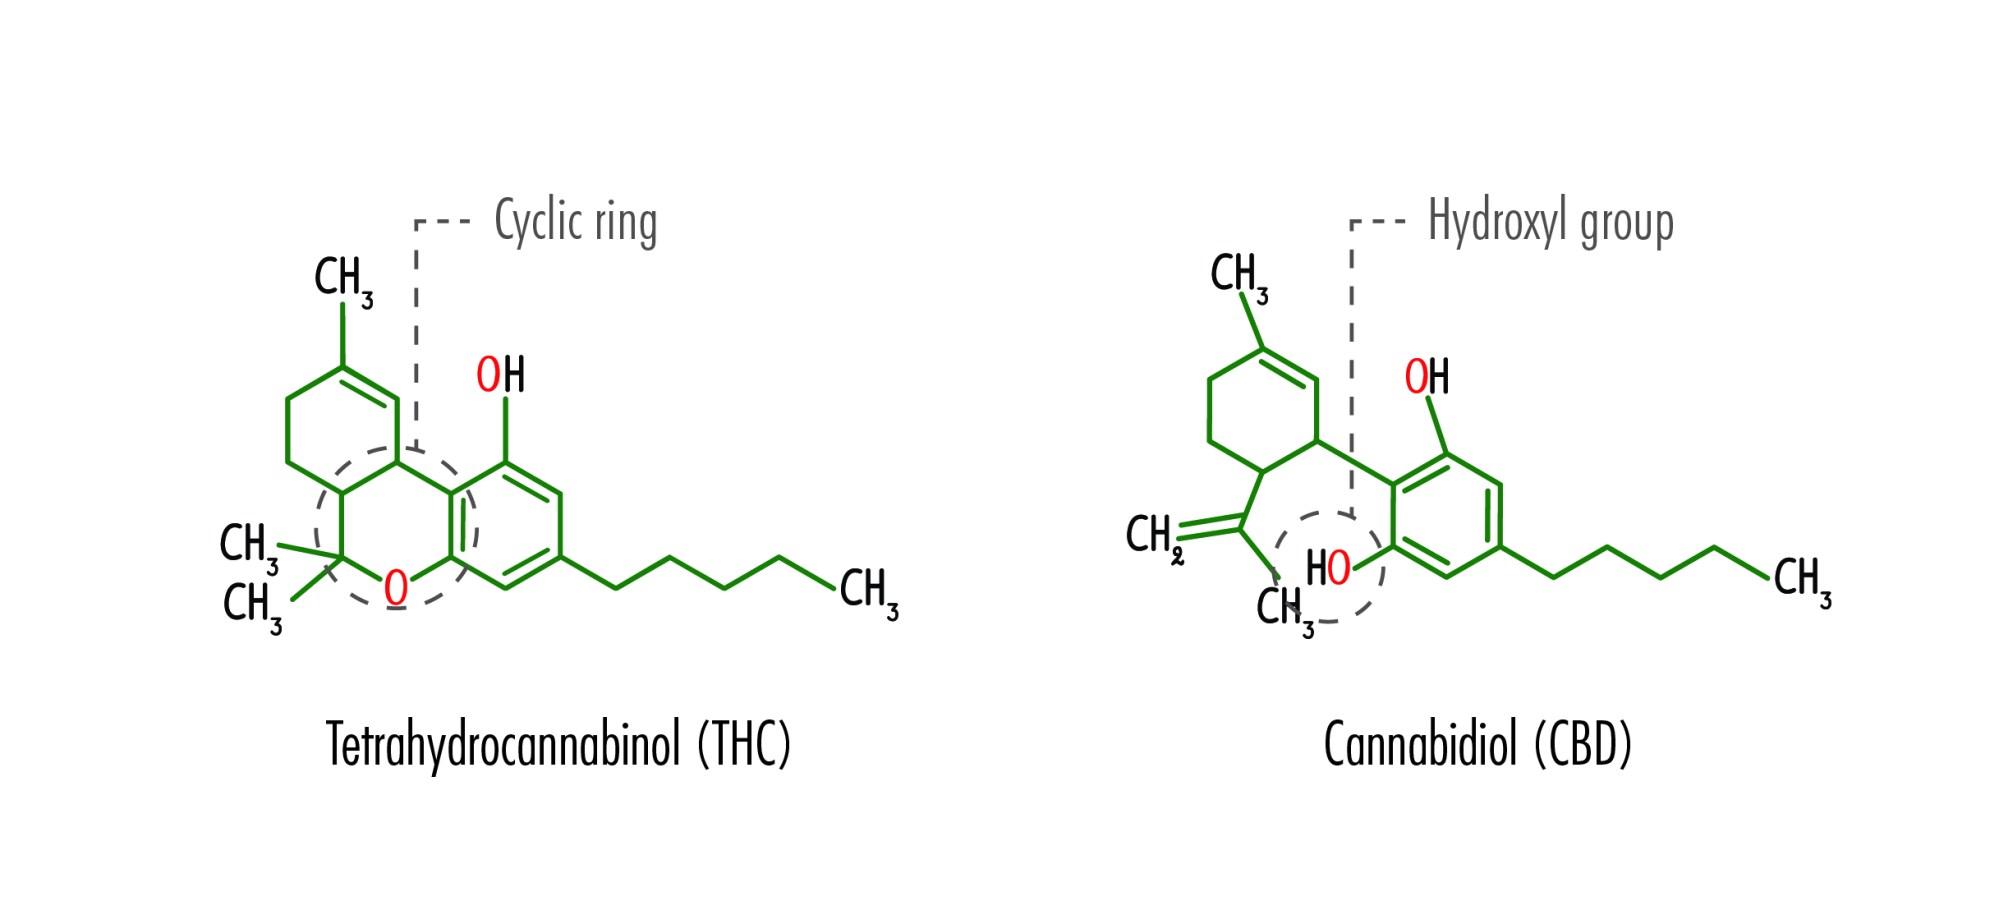 hight resolution of the structural formulas of tetrahydrocannabinol thc and cannabidiol cbd including the location